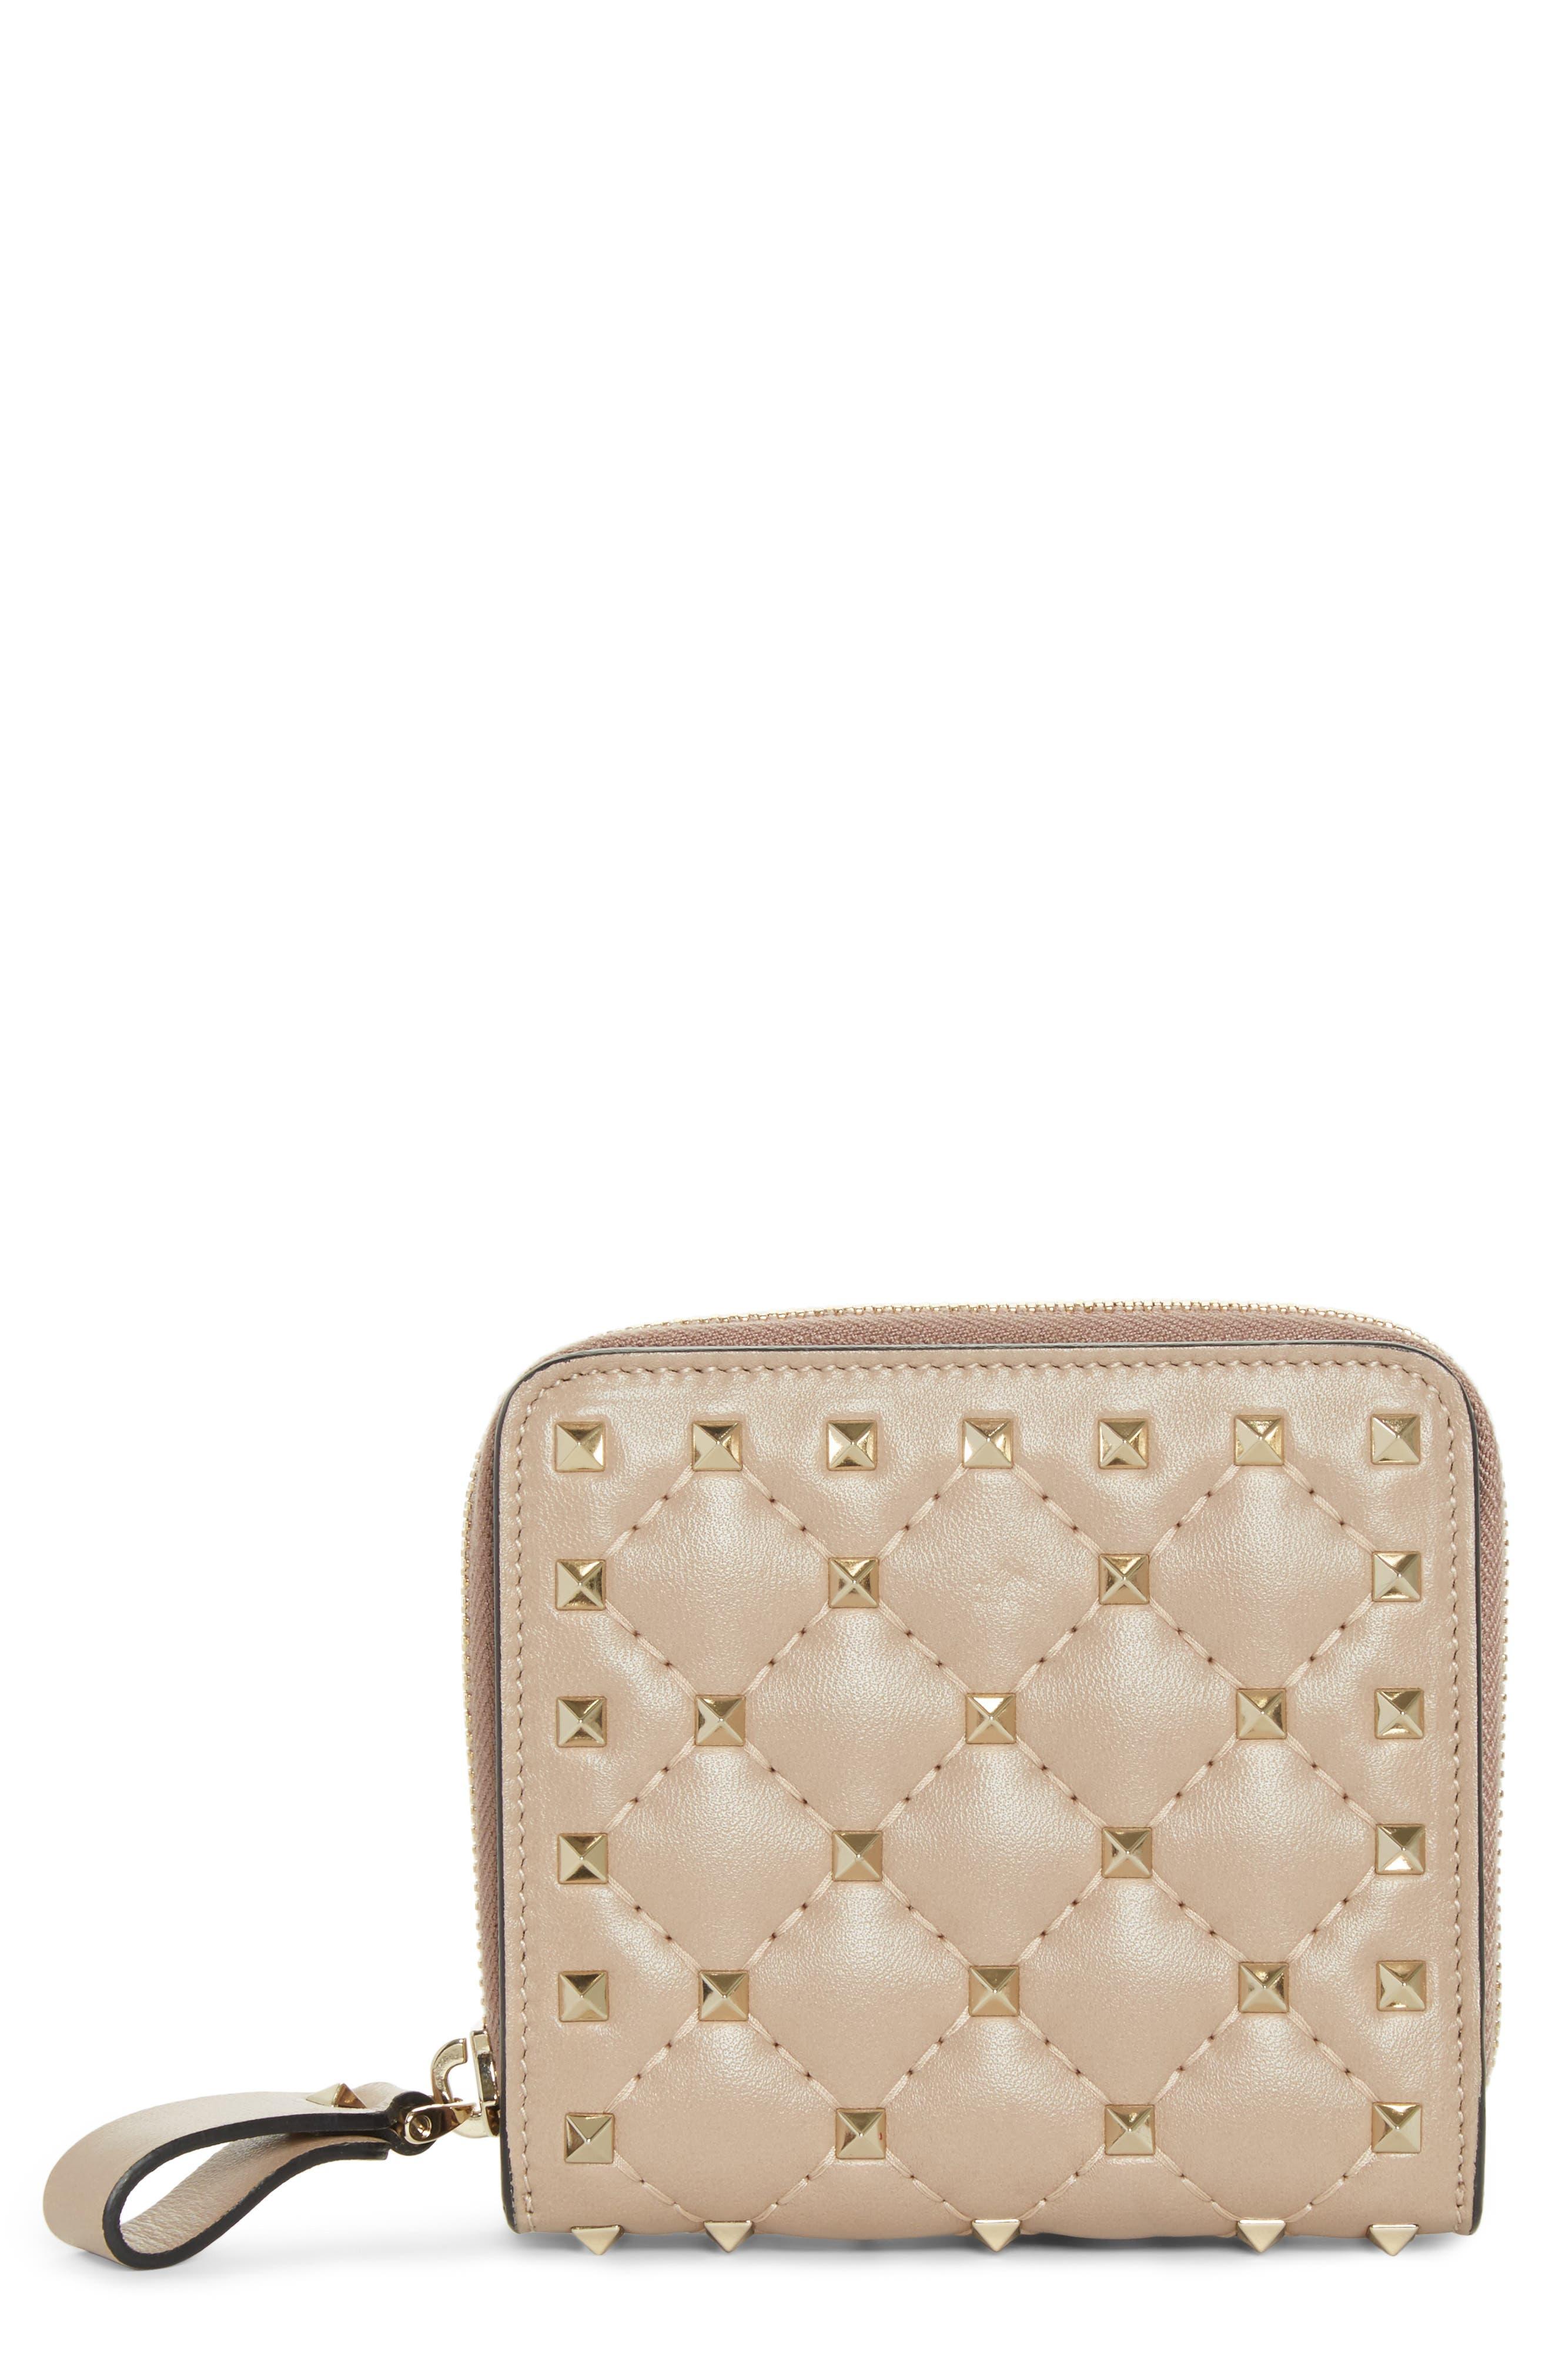 VALENTINO GARAVANI Rockstud Matelassé Leather French Wallet